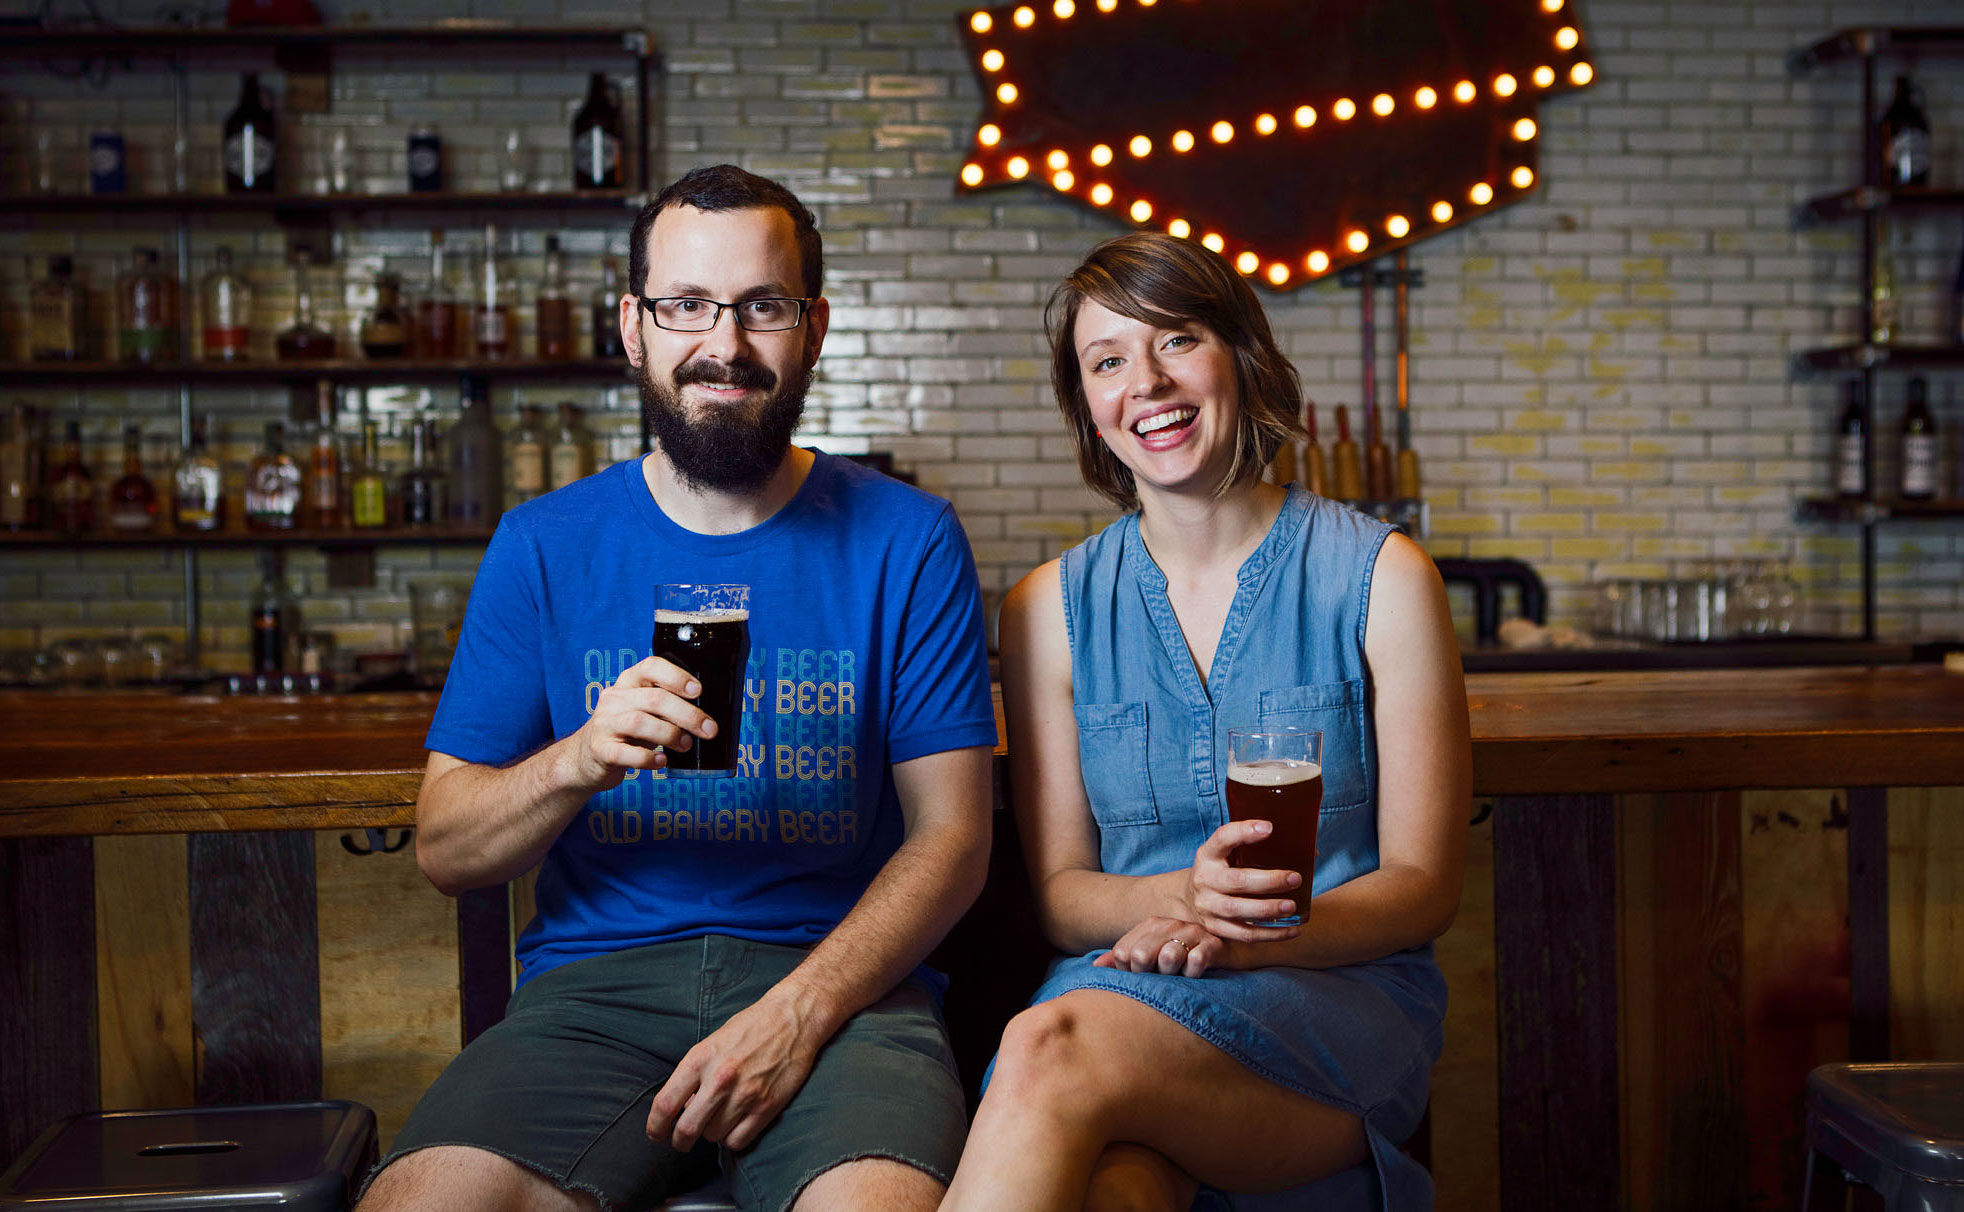 Old Bakery Beer Company. Photo: Adam Alexander/Courtesy of IOT